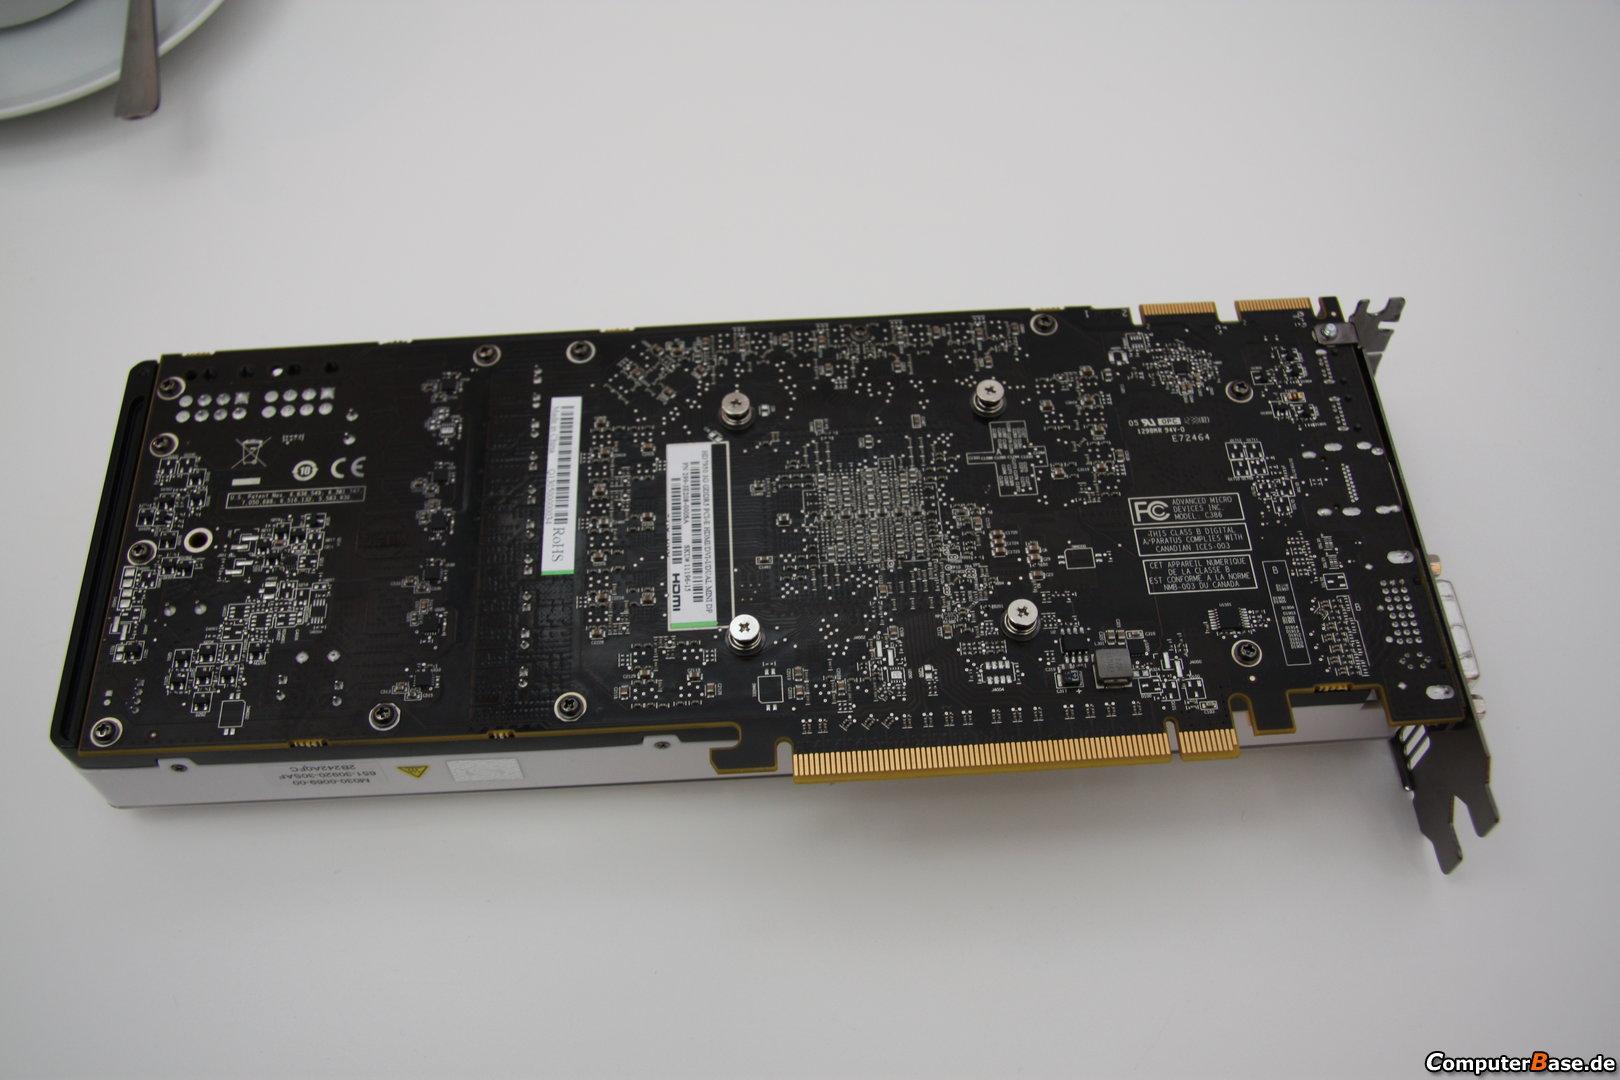 Sapphire Radeon Hd 7950 Mac Edition Pictured Techpowerup Forums Ssd Wd Green 120gb Sata M2 6gb S Jerman